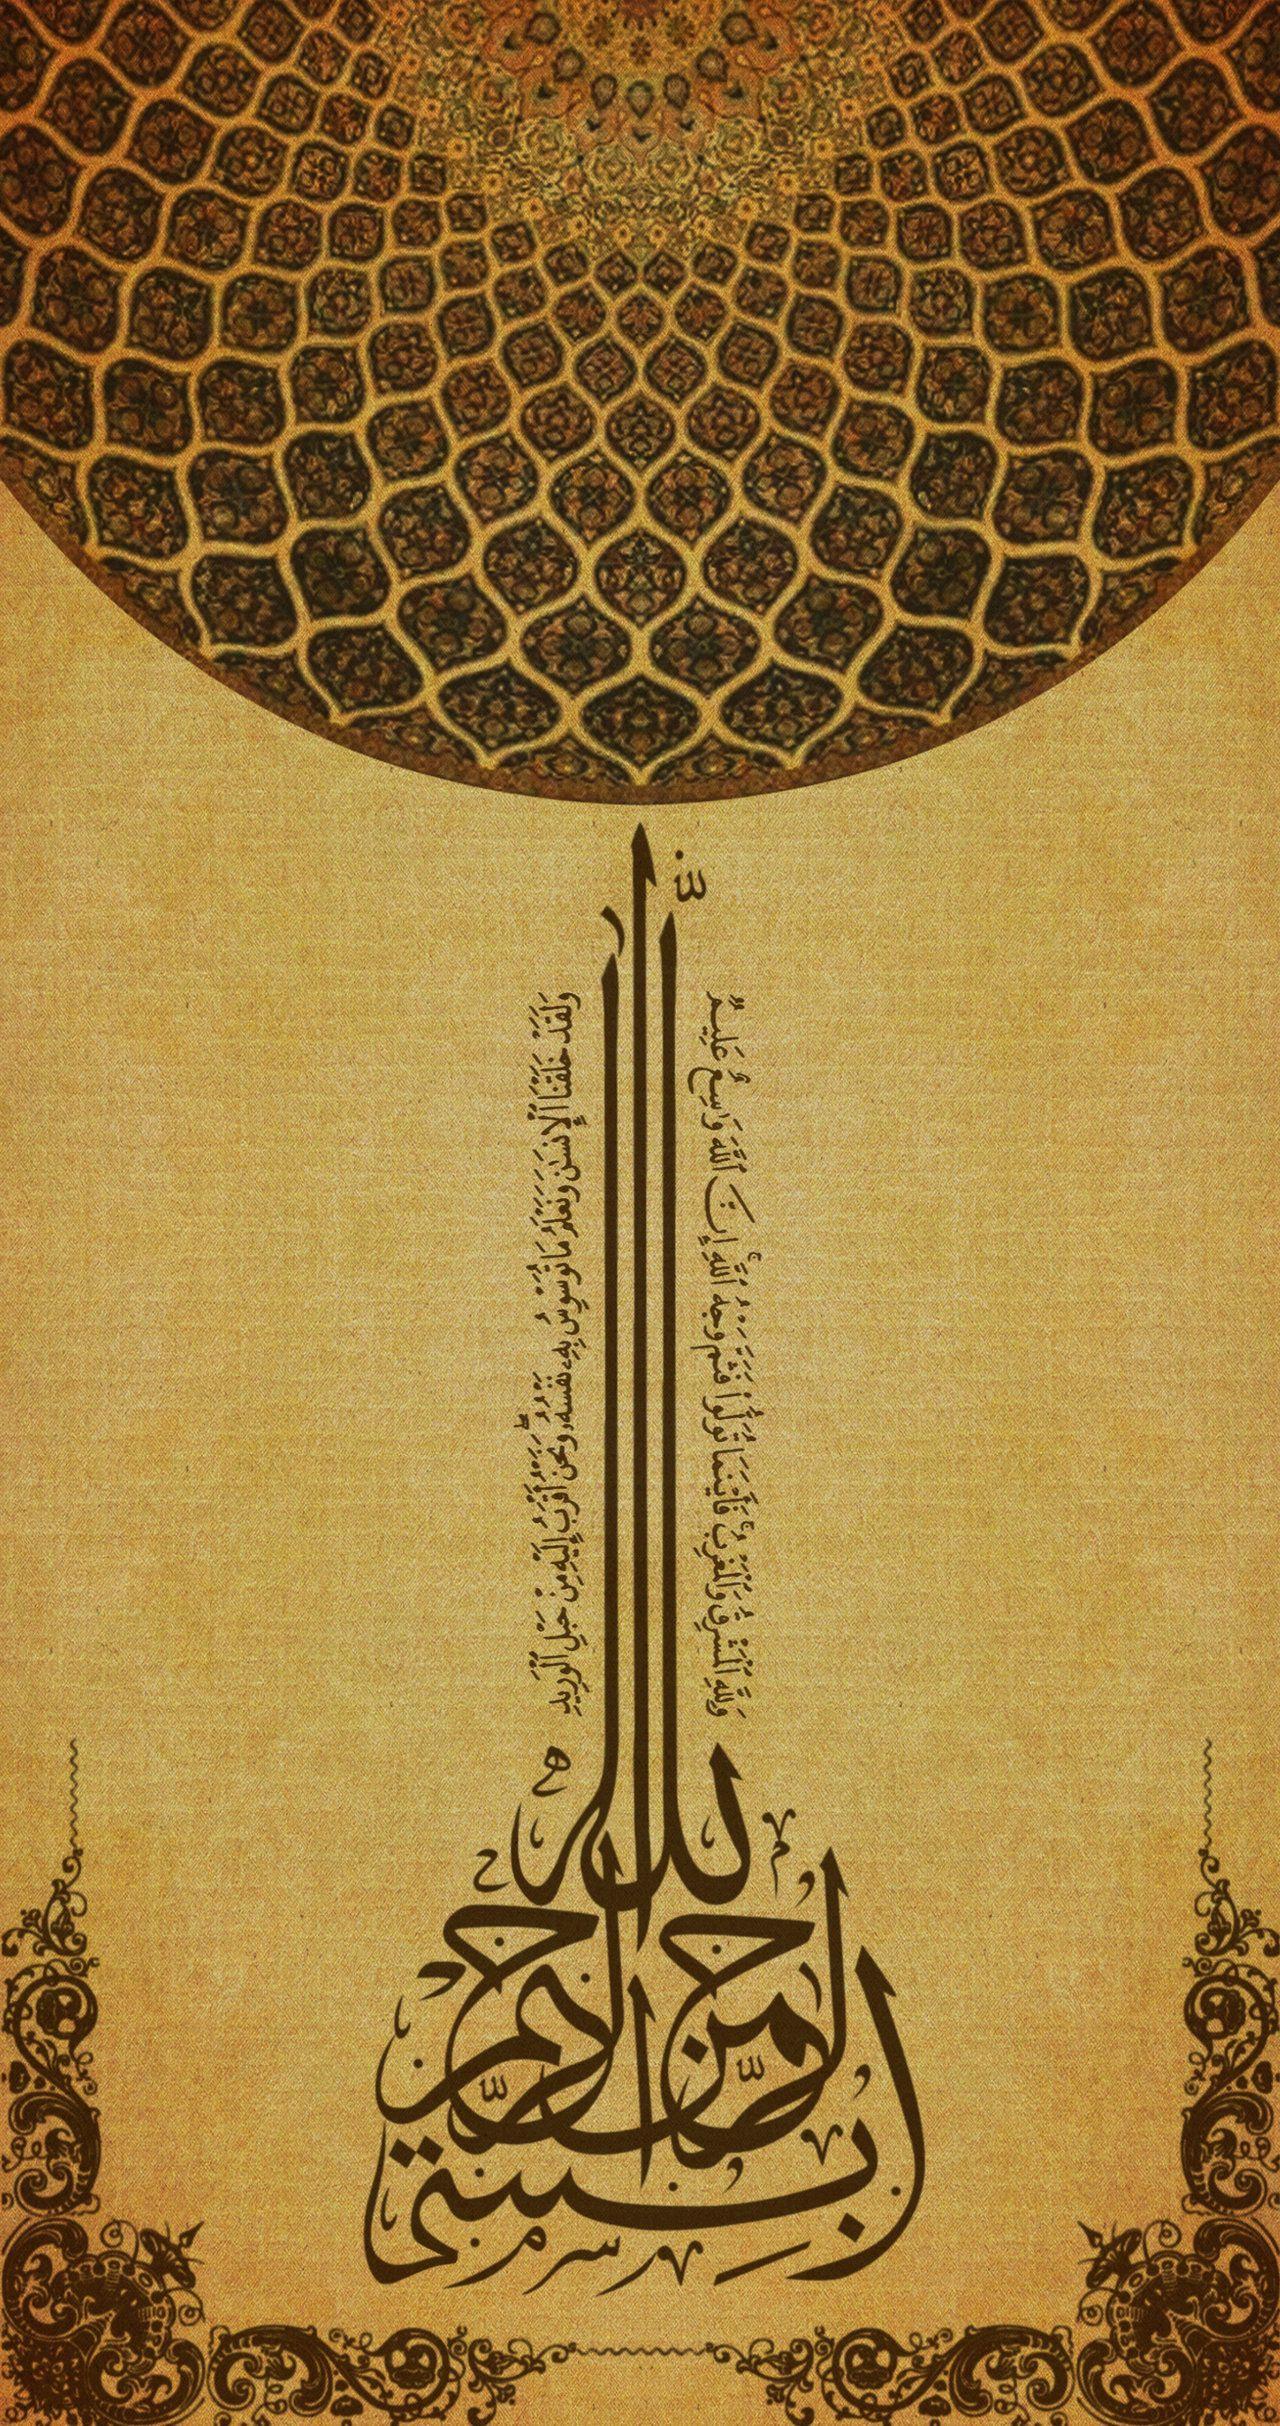 Bismillah Jugular Vein Quran Calligraphy Islamic Art Islamic Art Calligraphy Tessellation Patterns